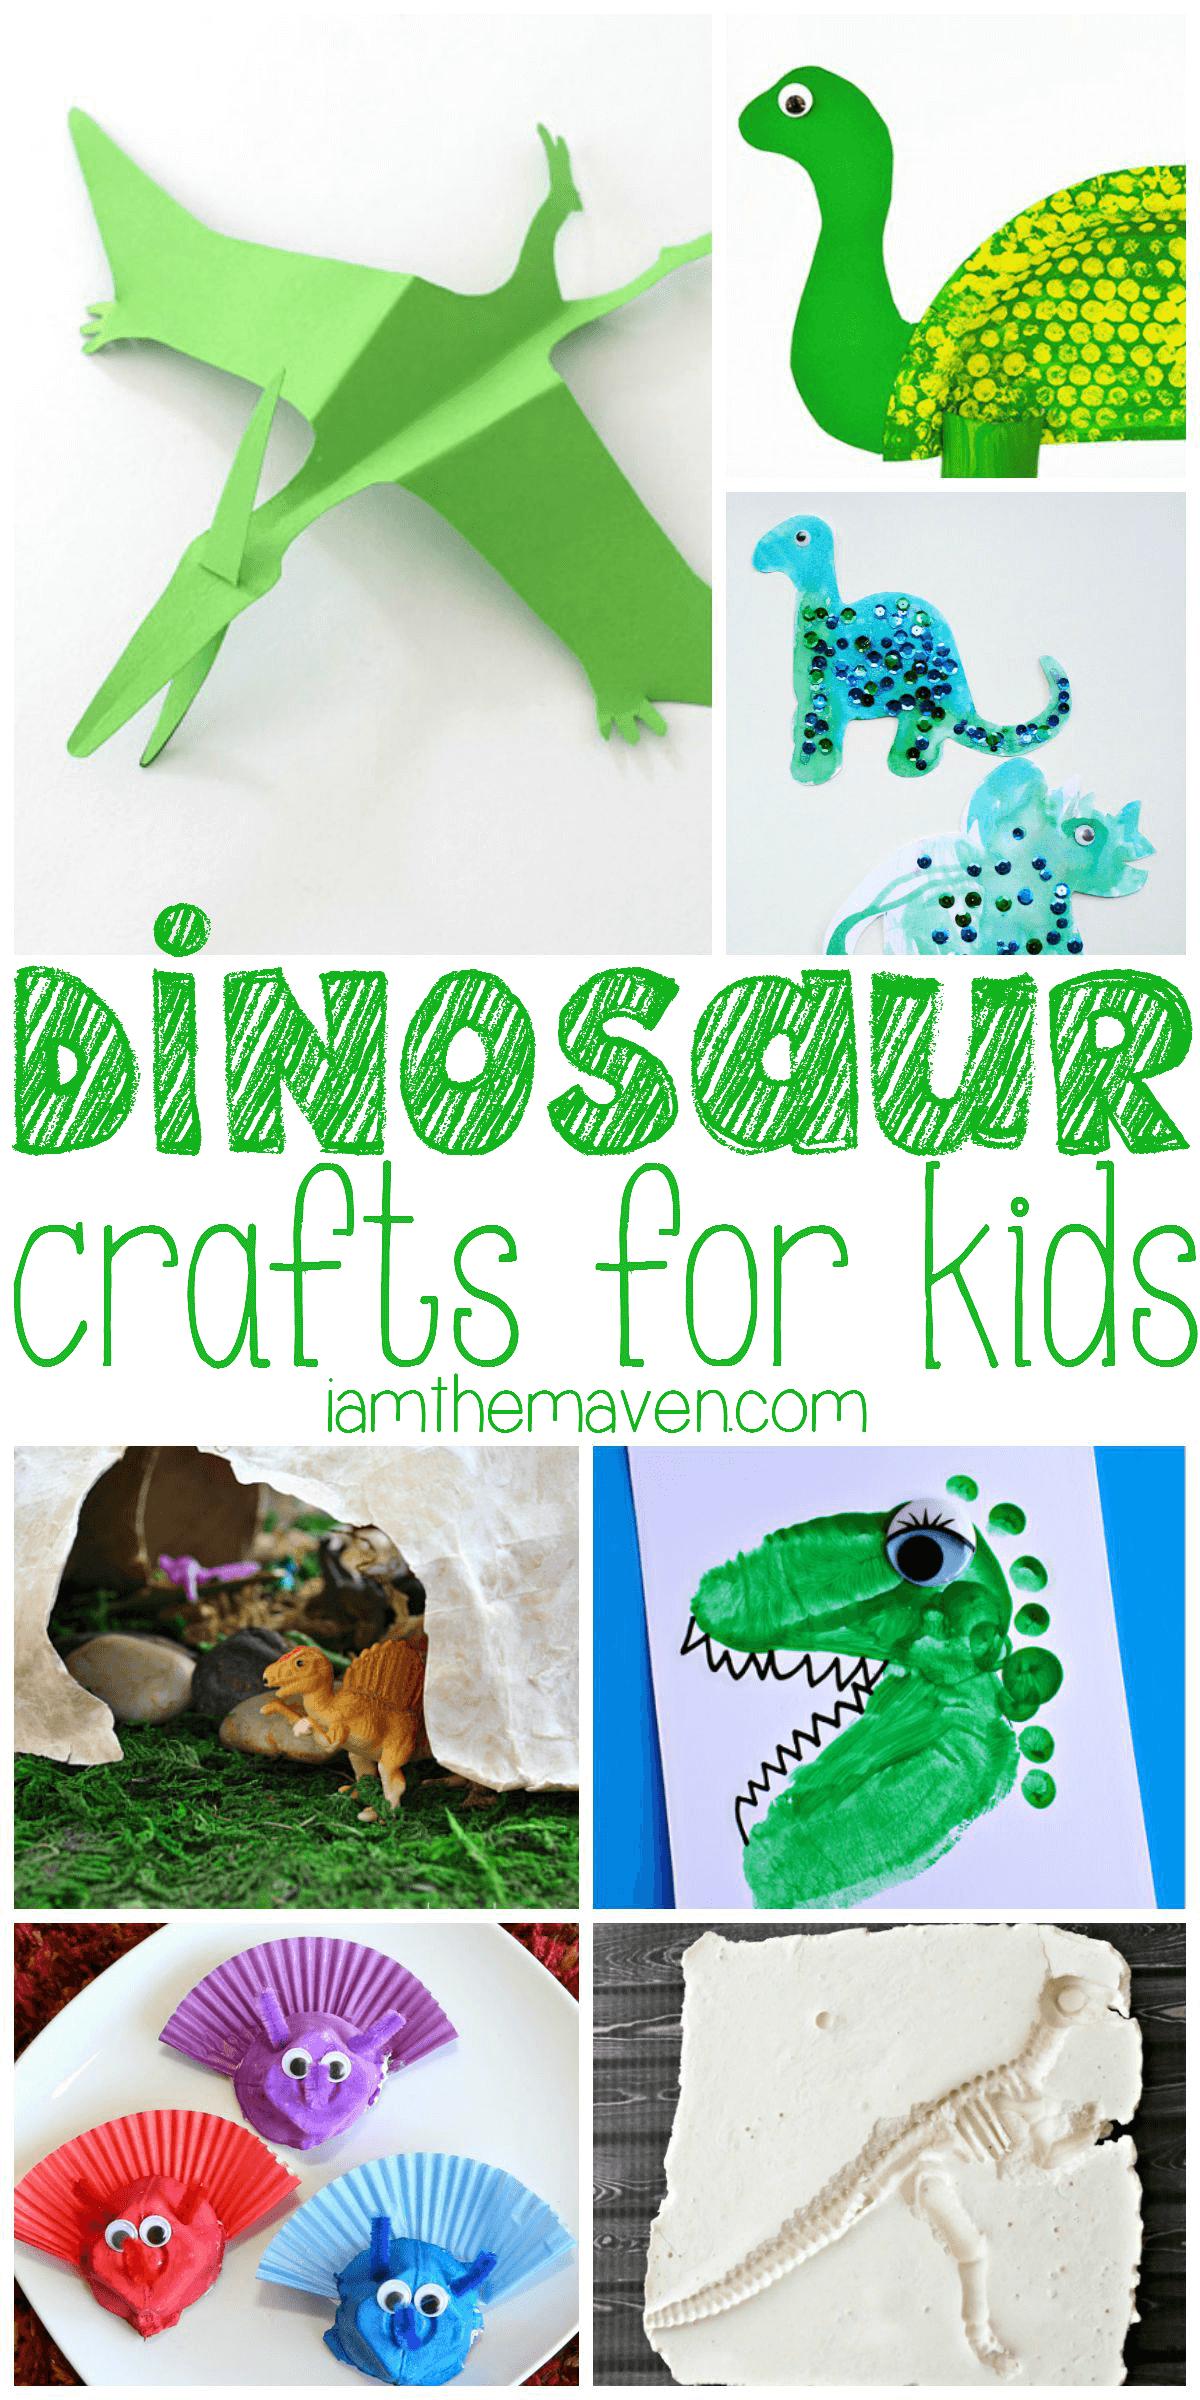 Dinosaur crafts for kids!